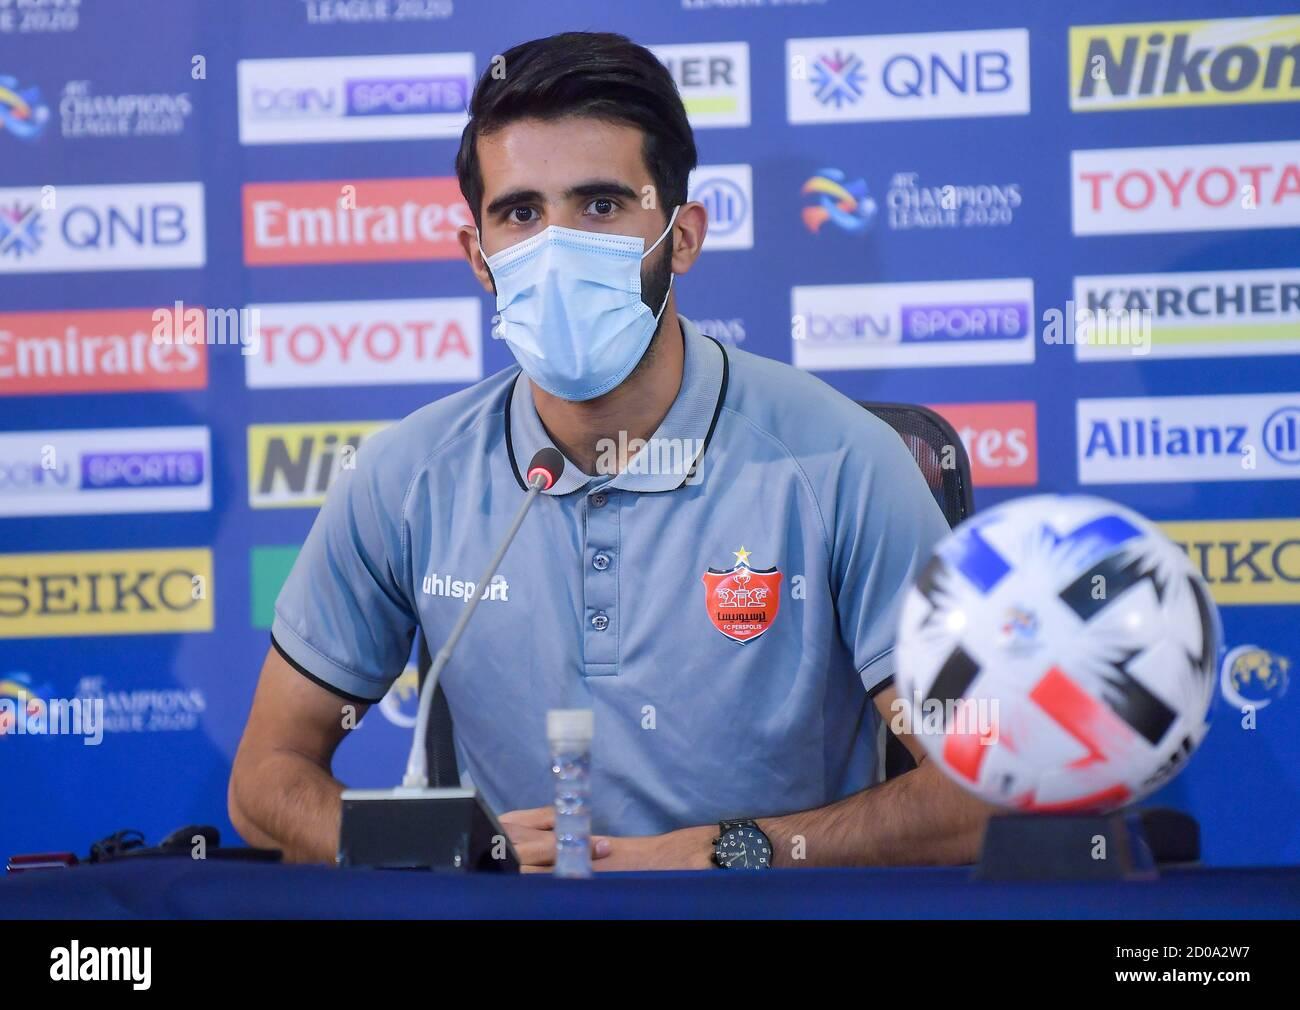 Doha Qatar 2nd Oct 2020 Persepolis Fc S Player Bashar Resan Bonyan Attends A Press Conference Ahead Of The Semi Final Match Of Afc Champions League Between Al Nassr Fc Of Saudi Arabia And